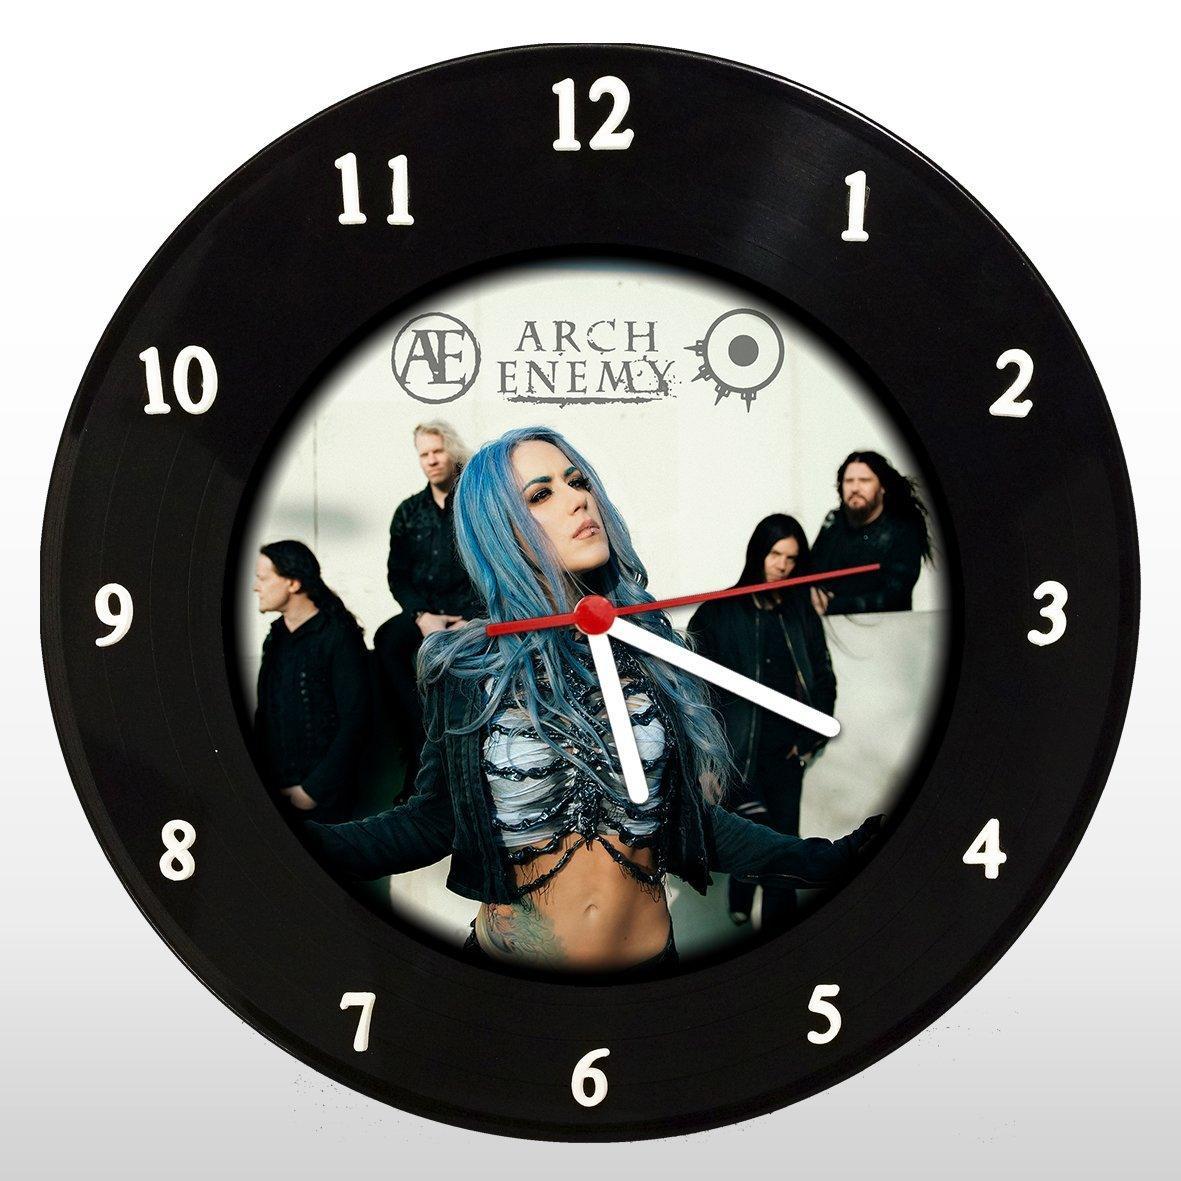 Arch Enemy - Relógio de Parede em Disco de Vinil - Mr. Rock